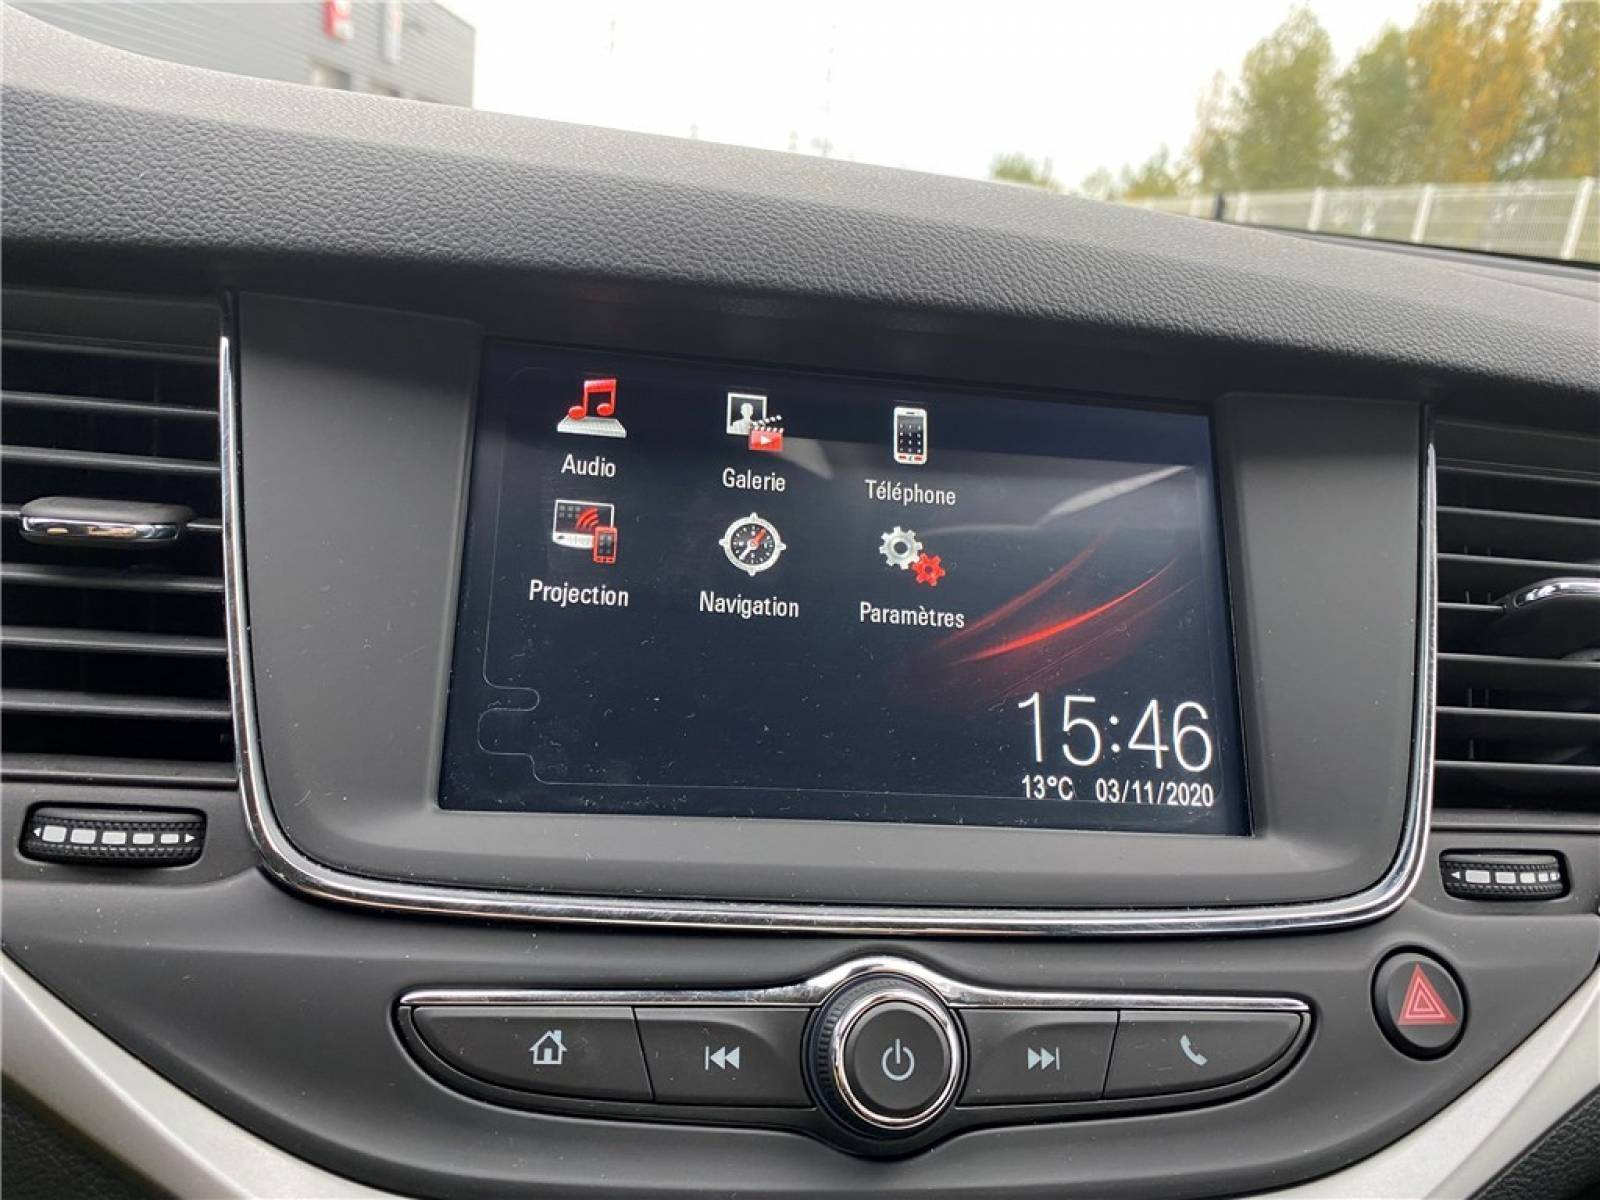 OPEL Astra 1.5 Diesel 105 ch BVM6 - véhicule d'occasion - Groupe Guillet - Opel Magicauto - Chalon-sur-Saône - 71380 - Saint-Marcel - 20